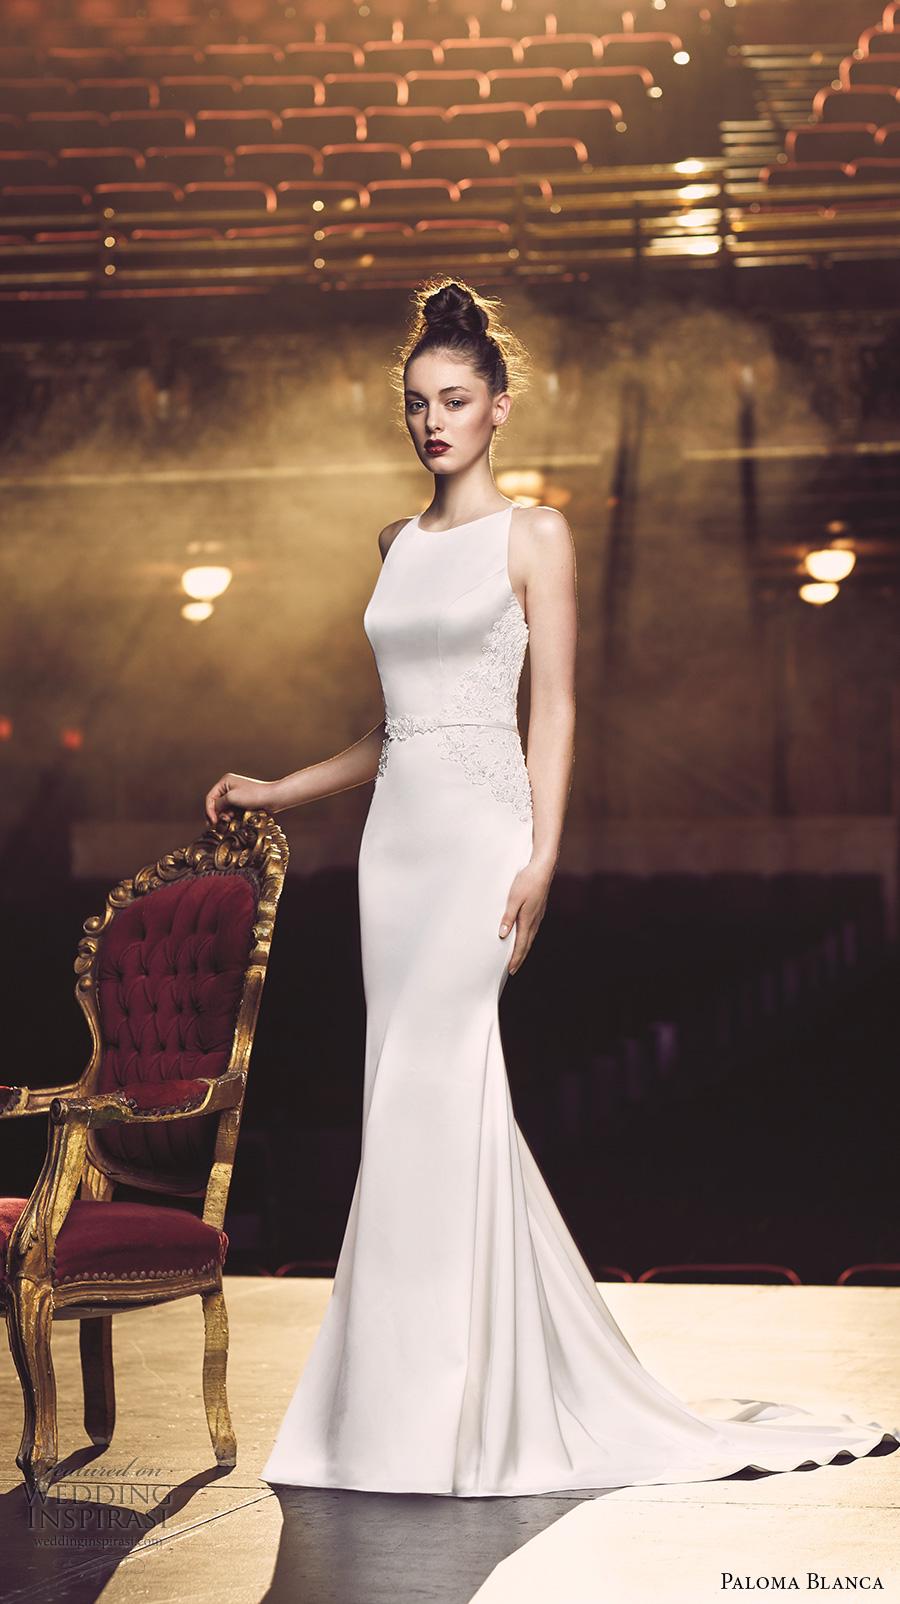 Paloma Blanca Wedding Dresses For Sale 22 Cute paloma blanca fall bridal